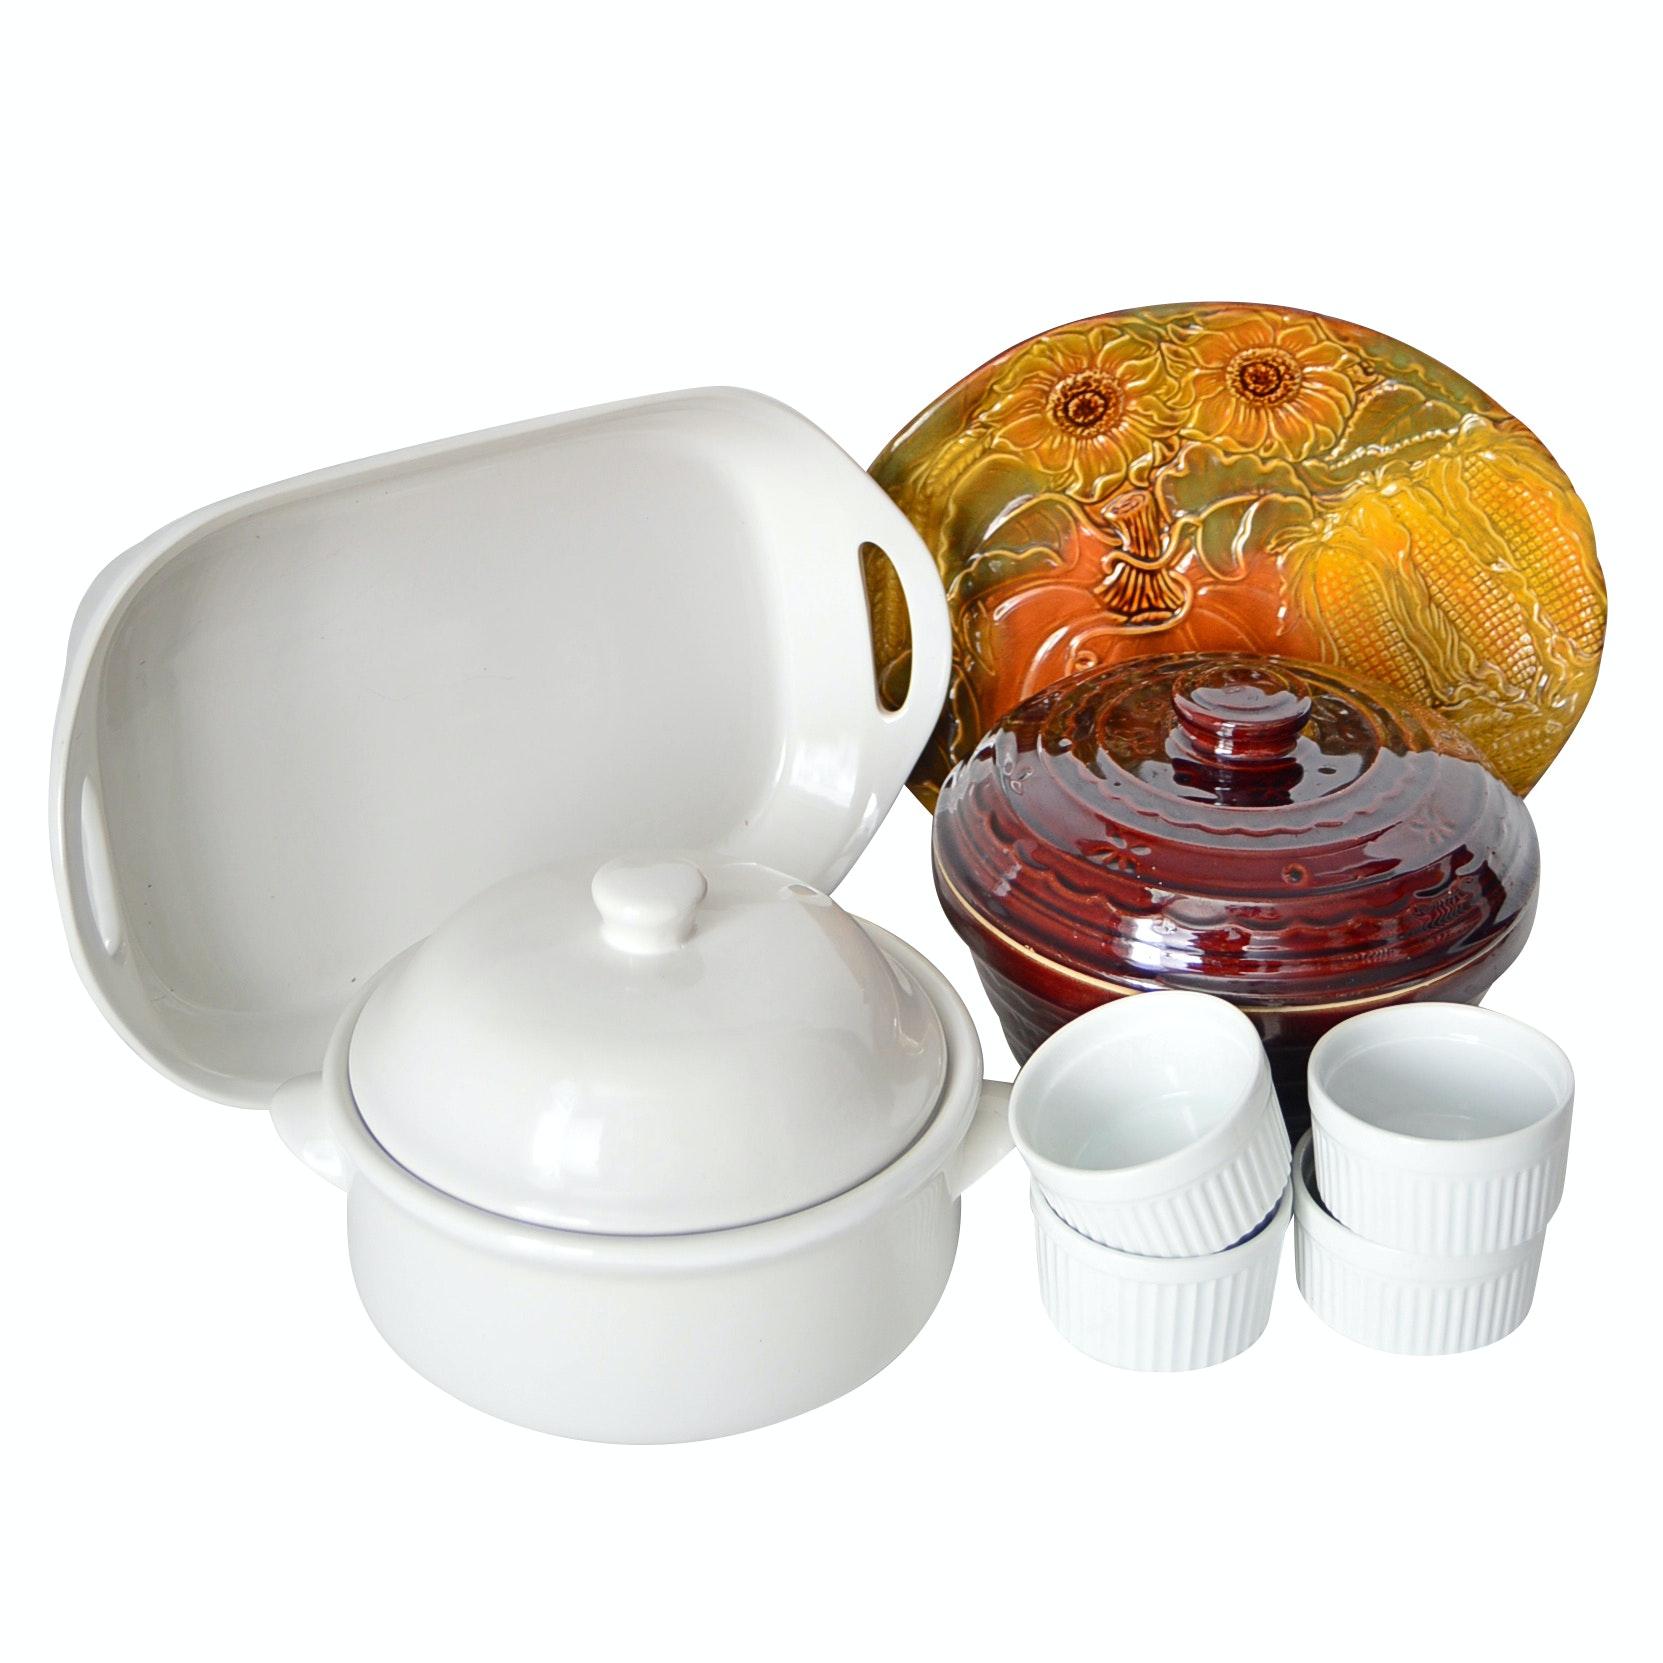 Ceramic Bakeware with Vintage Casserole, CorningWare